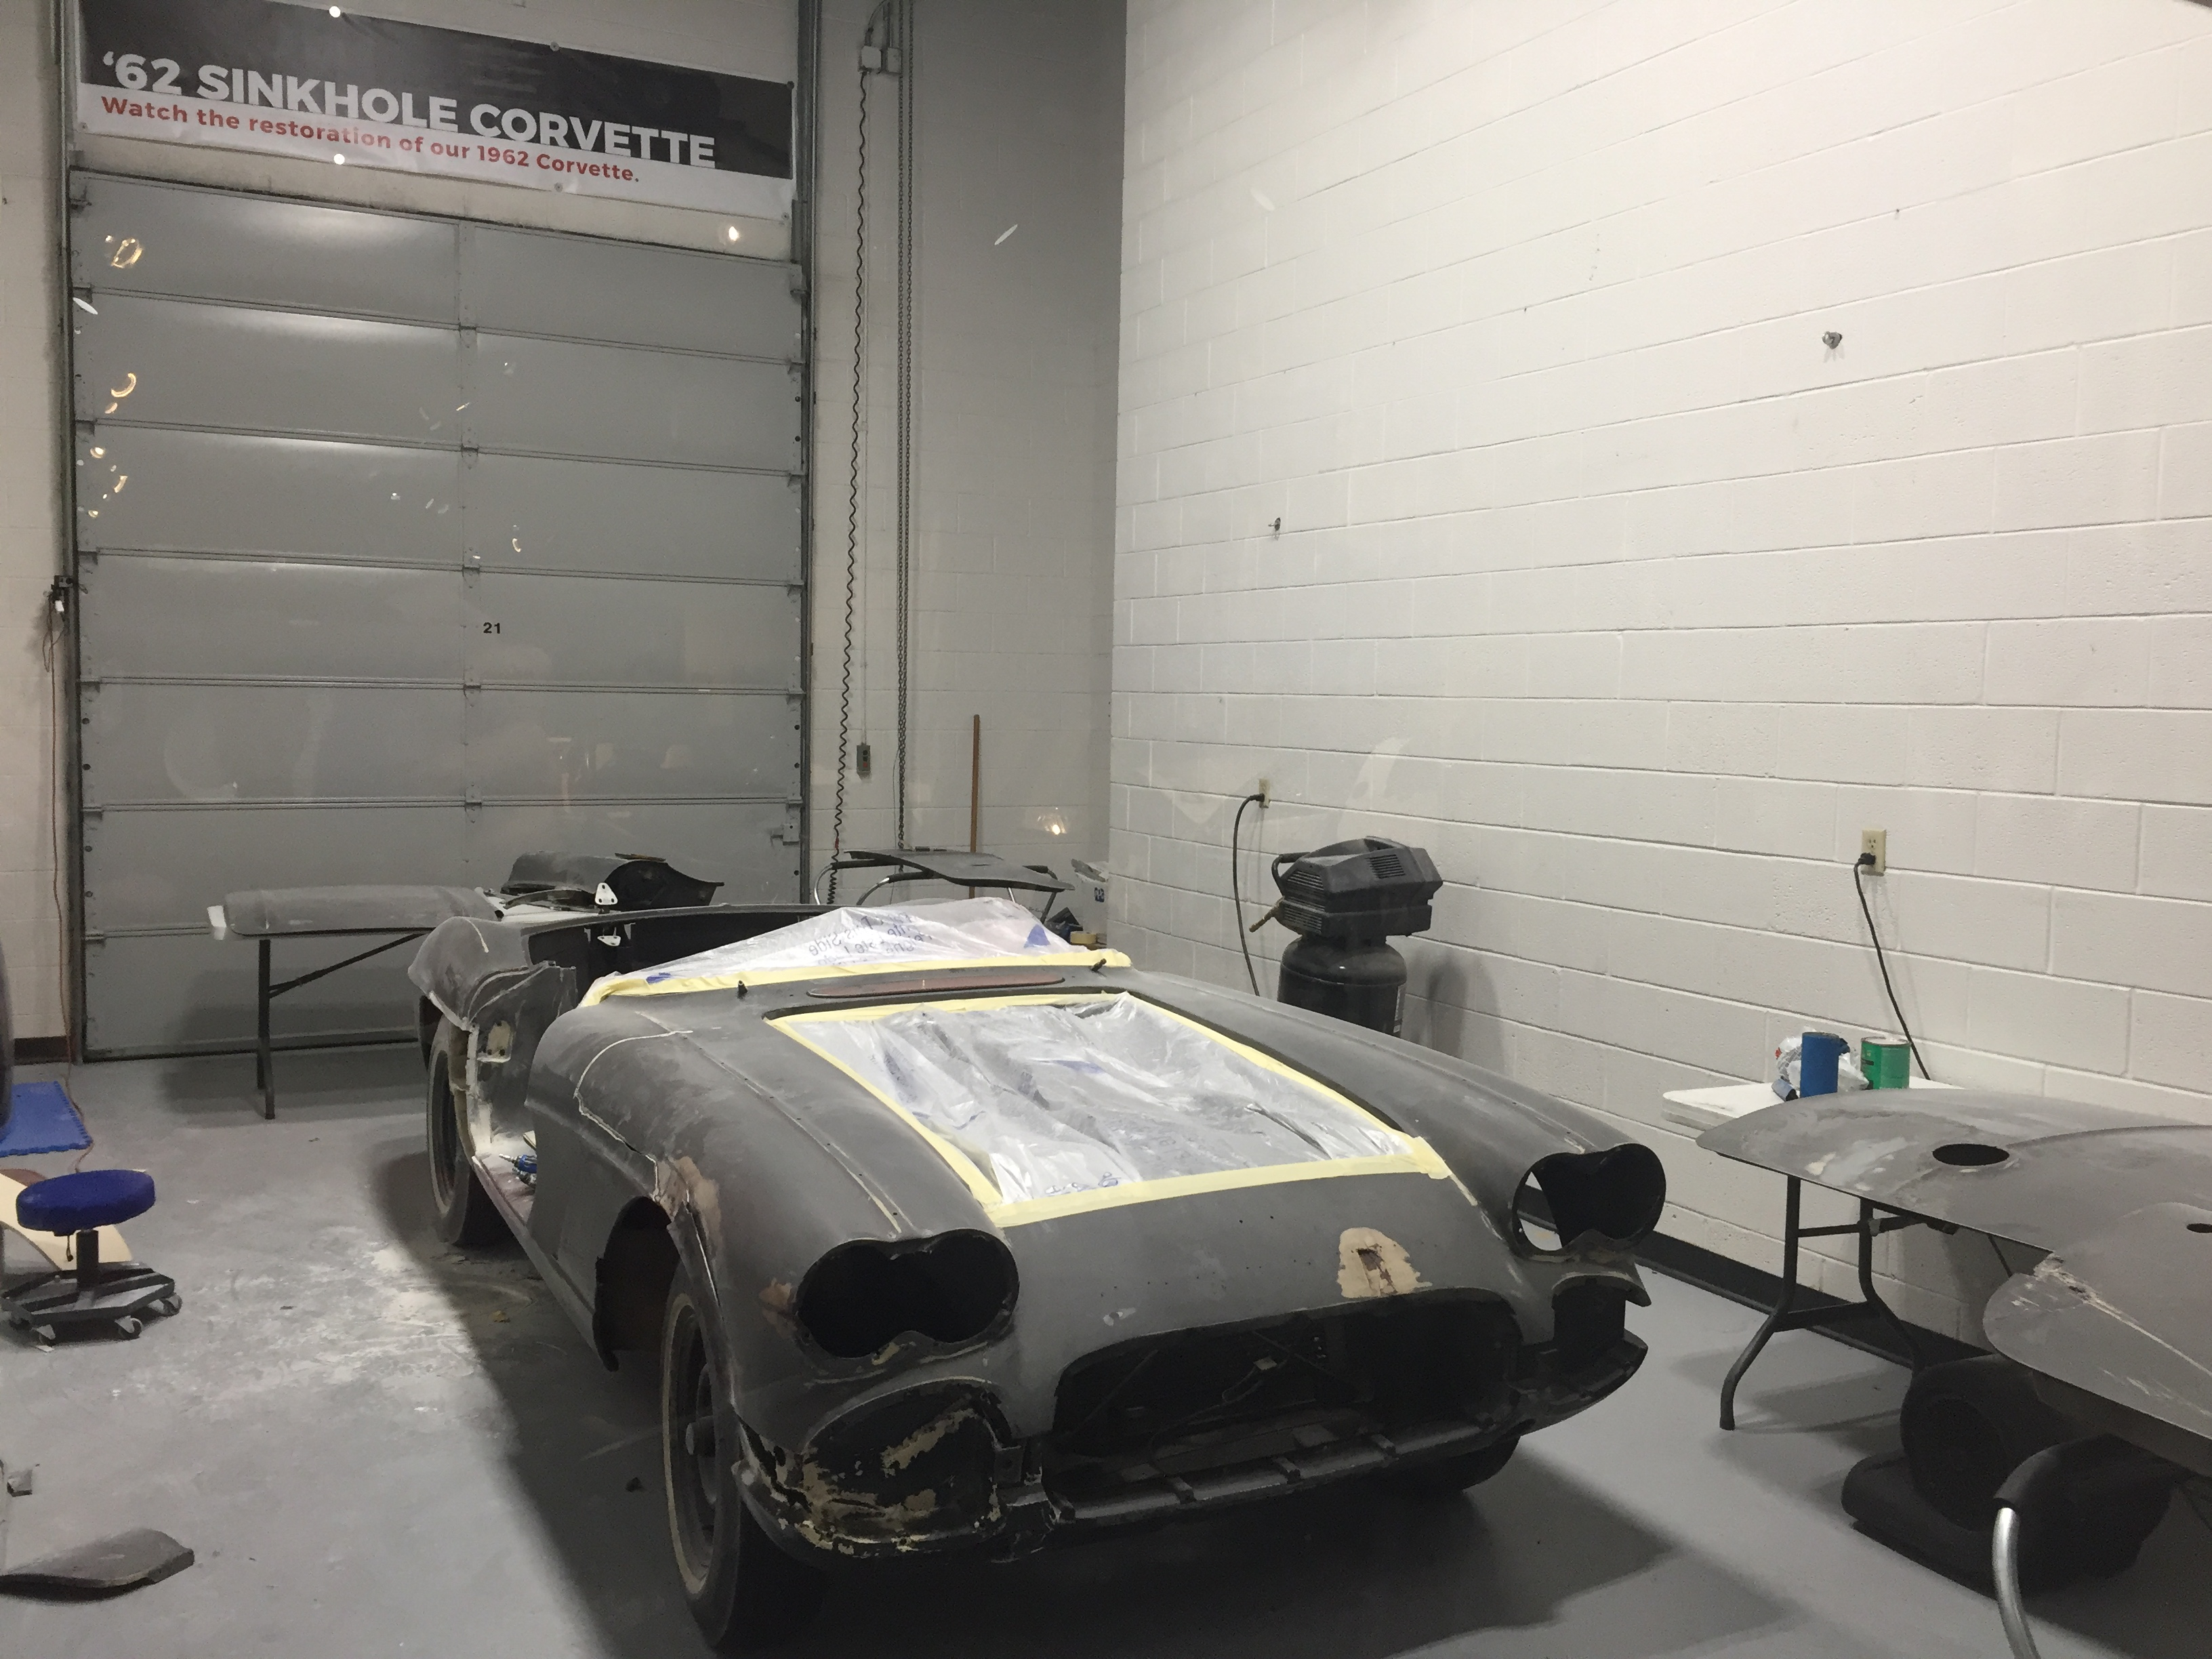 1962 Corvette restoration